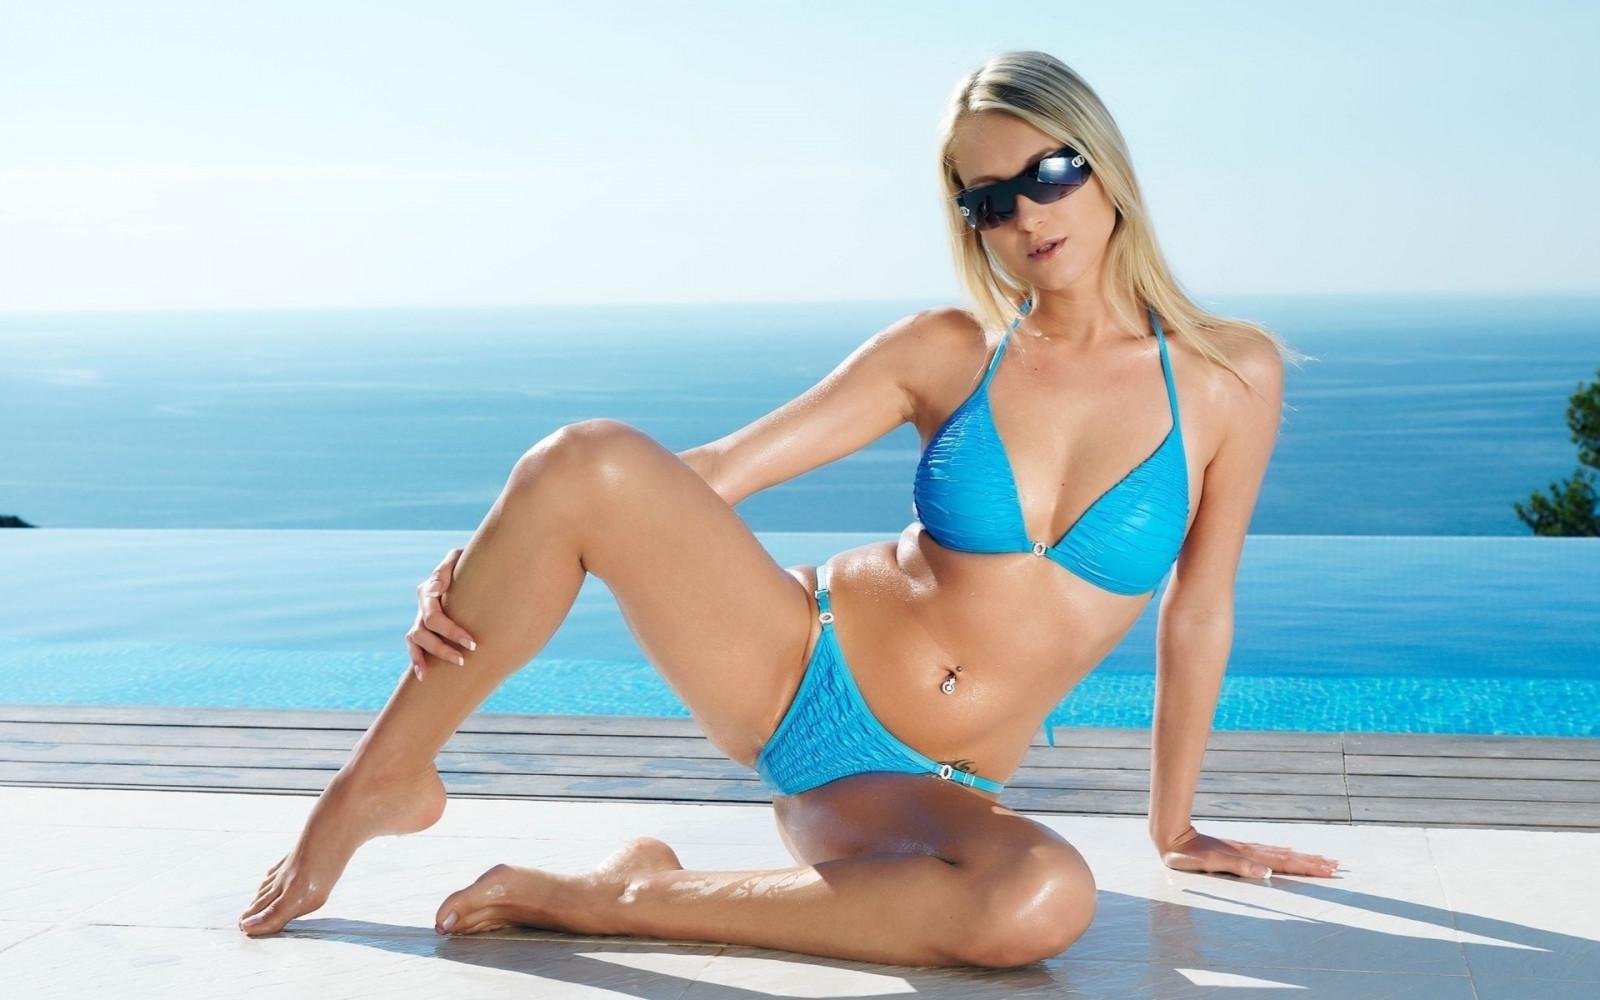 Free bikini desktop wallpapers — 15